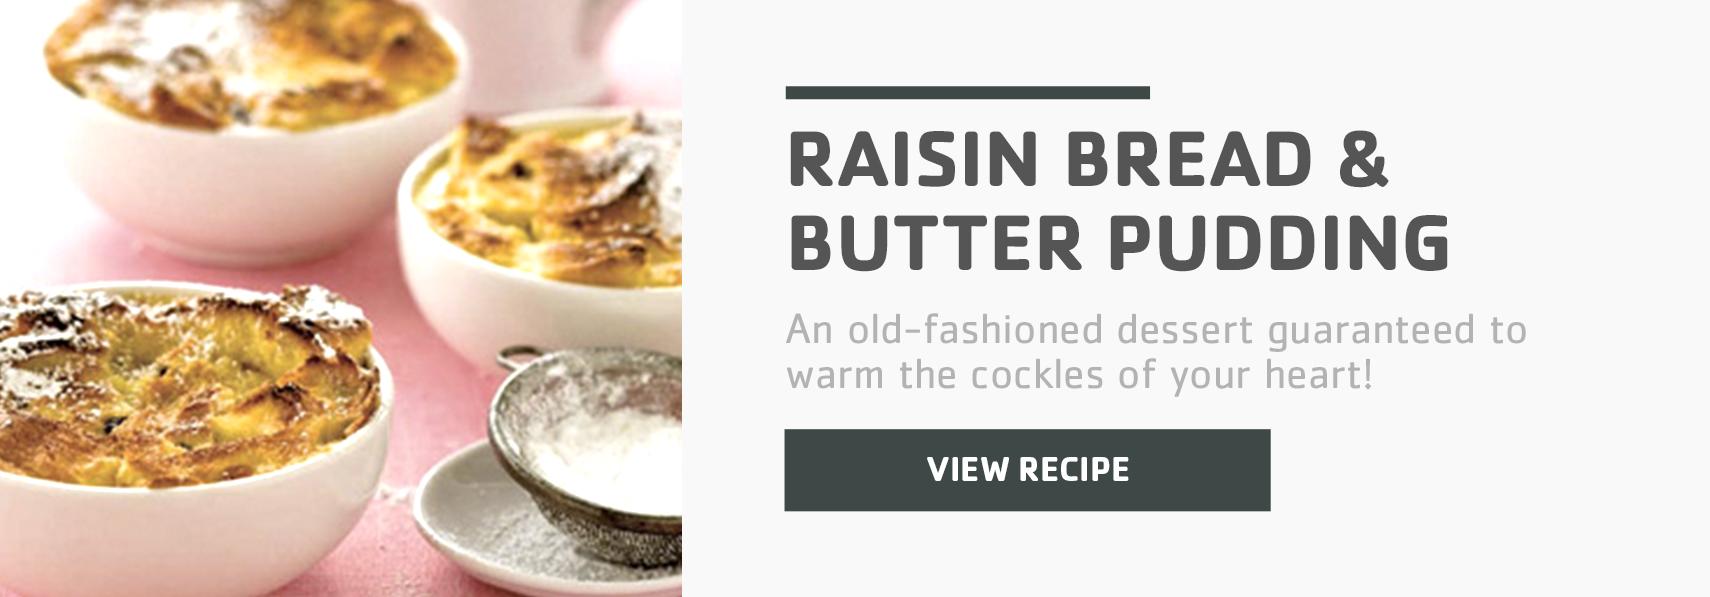 Raisin-Bread-&-Butter-Pudding.jpg